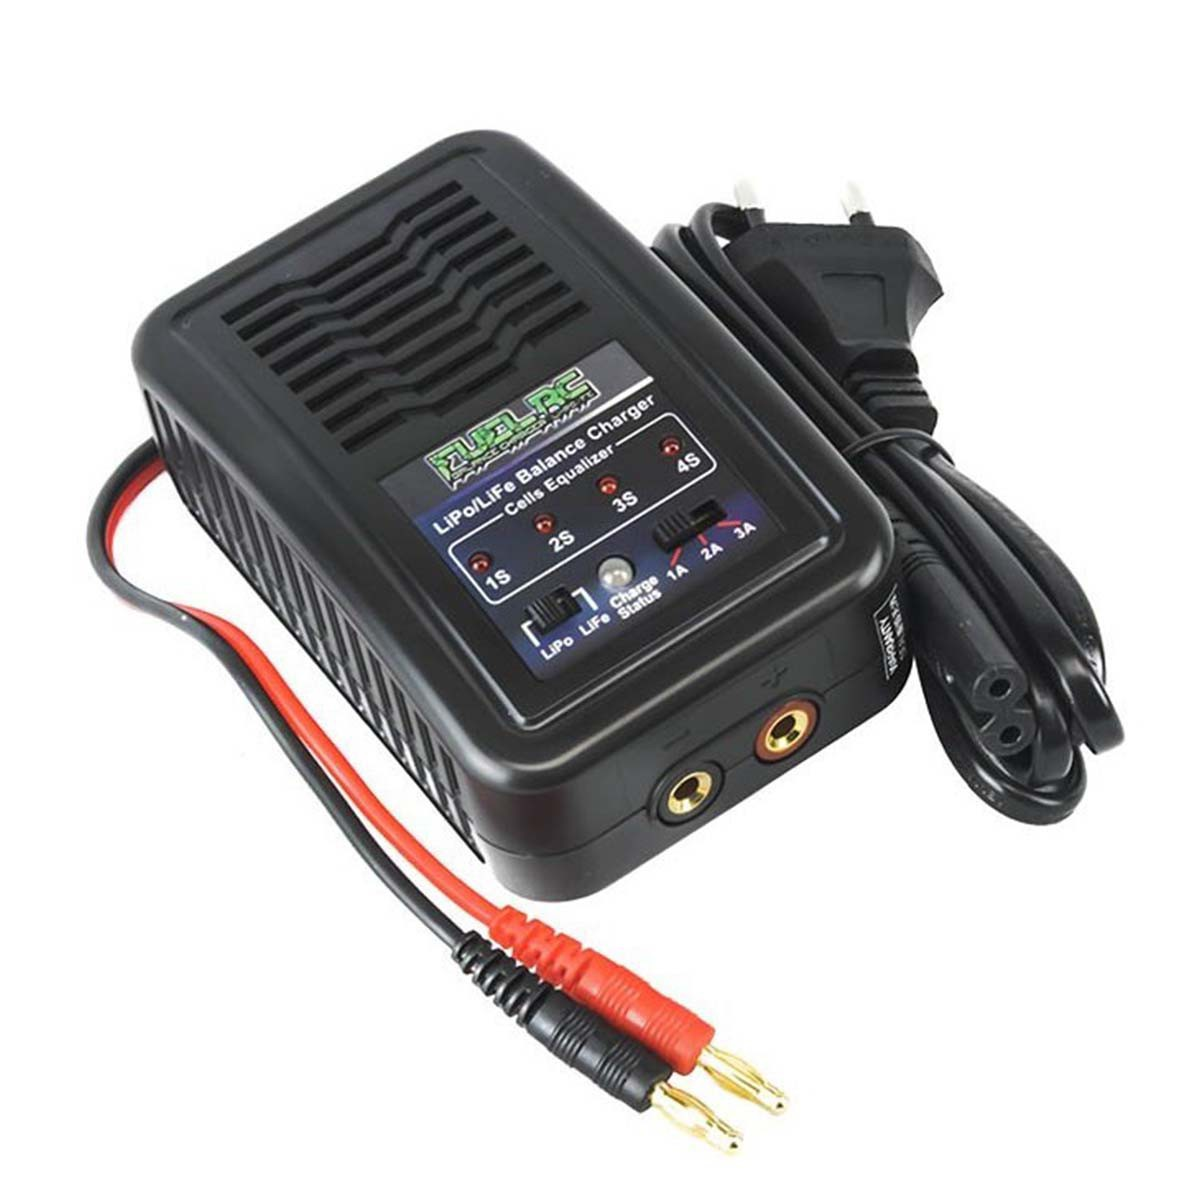 Caricabatterie per Batterie Lipo Life 7.4V 14.8V Bilanciatore Fuel Rc